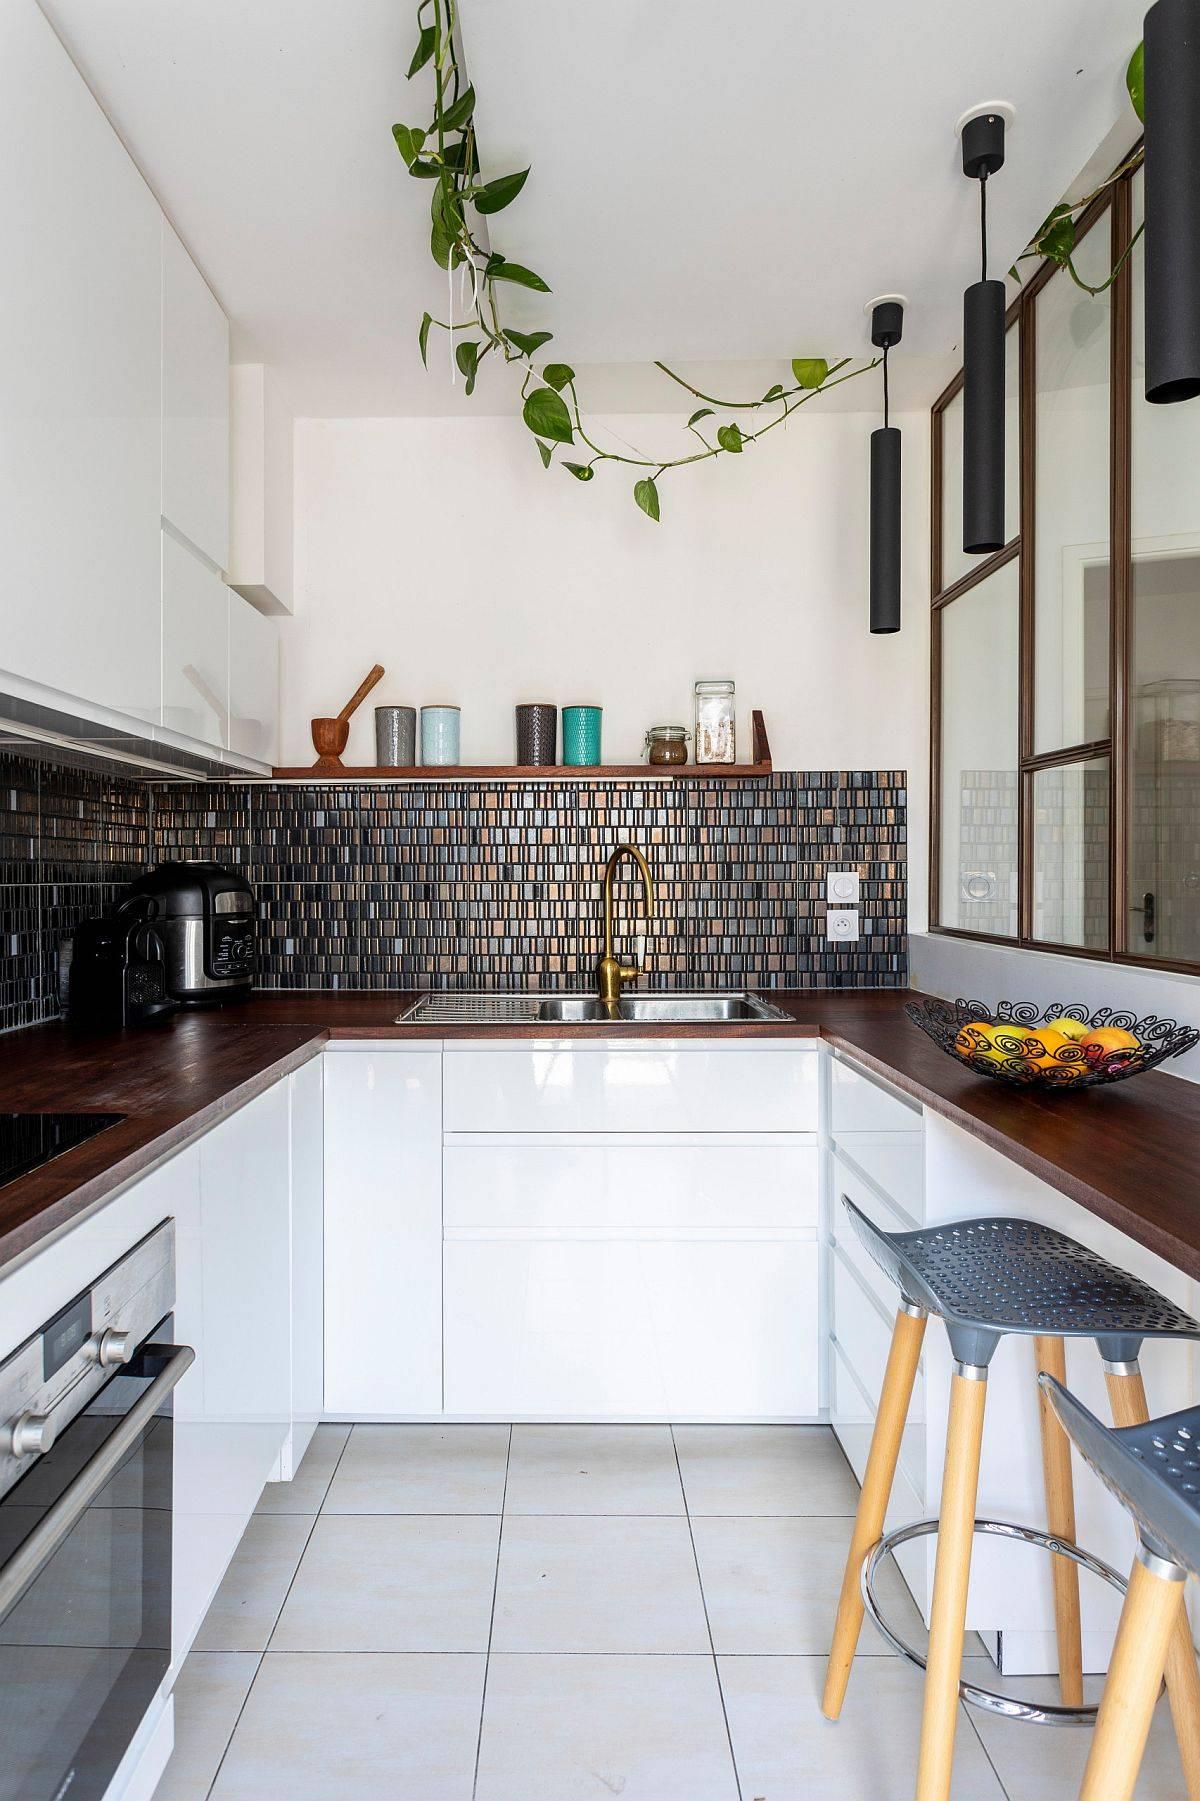 Custom-kitchen-with-three-cylincrical-pendant-lights-and-a-fabulous-mosaic-backsplash-64456